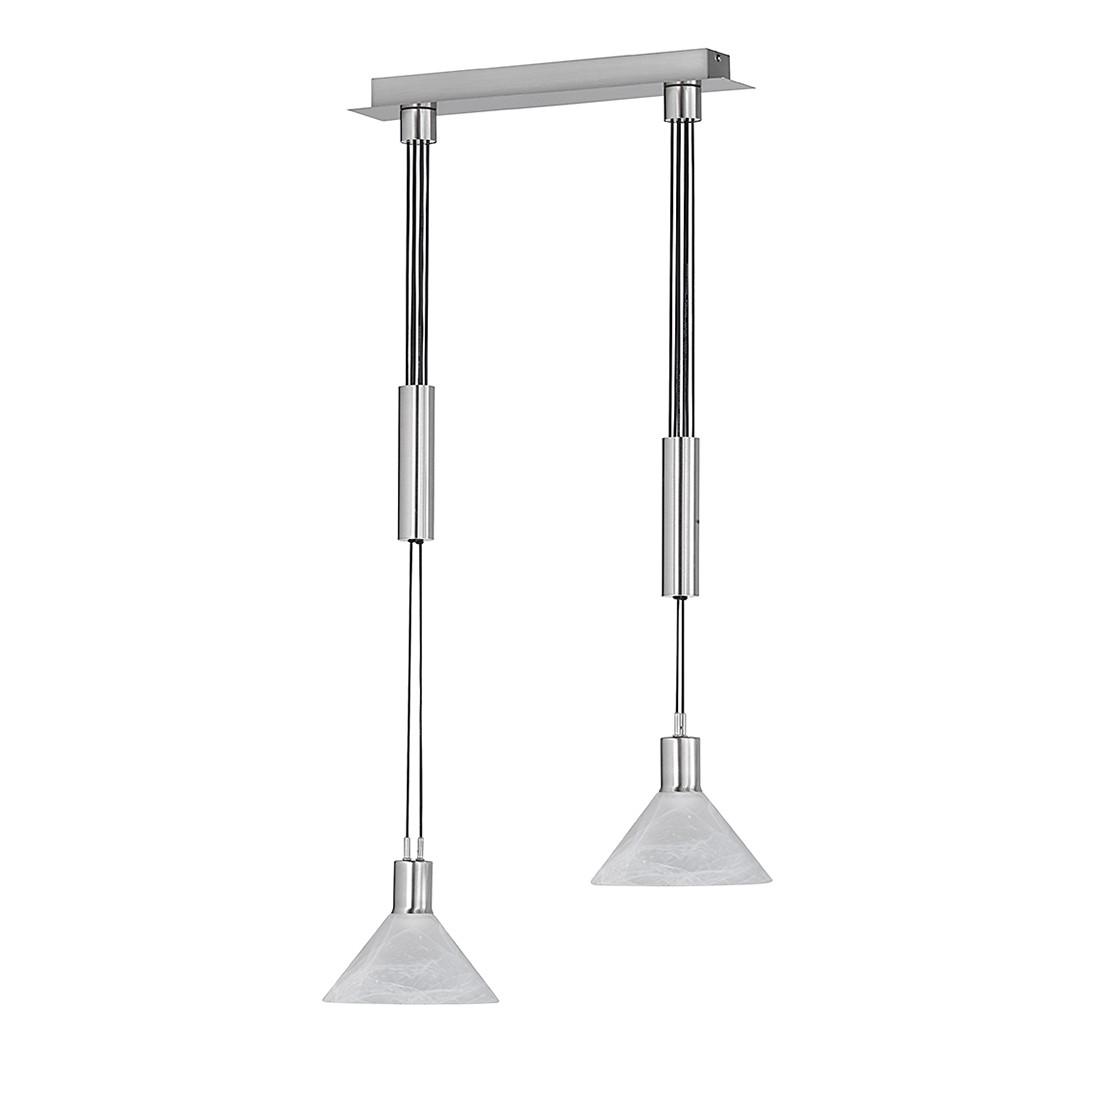 energie  A+, Hanglamp MAINE - metaal/glas 2 lichtbronnen, Action